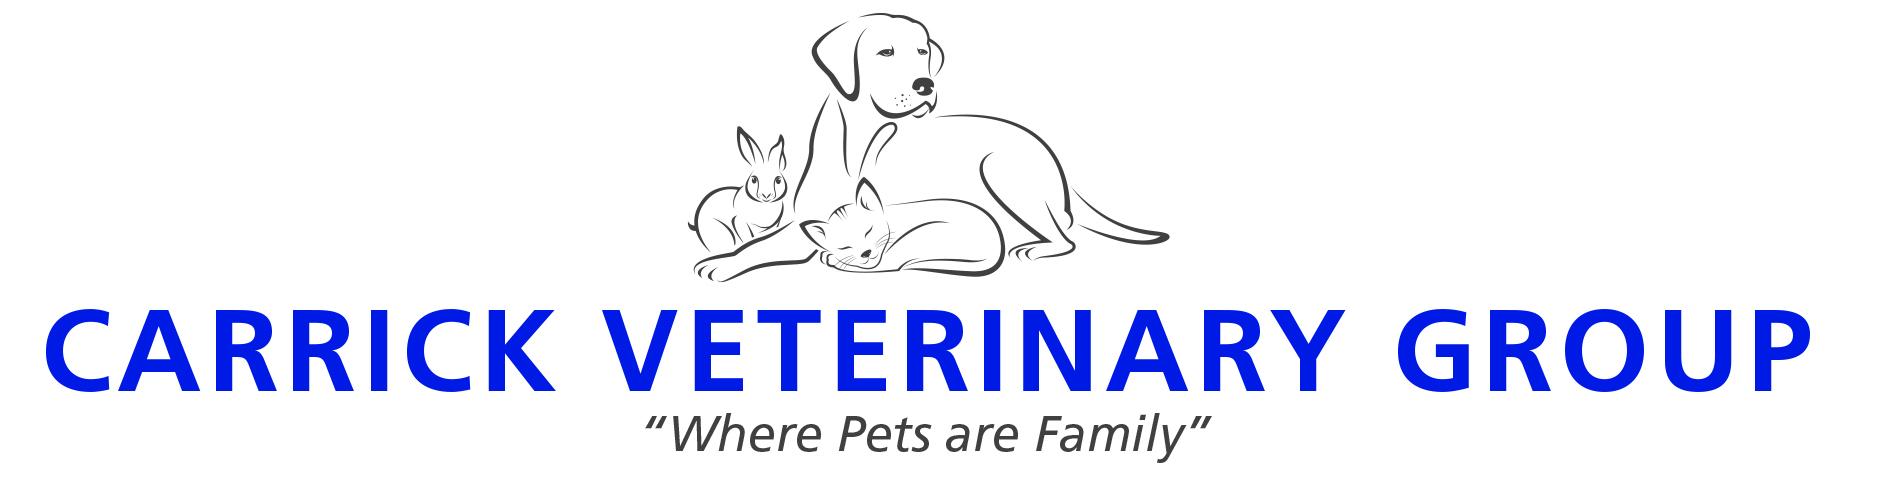 Carrick Veterinary Group - Hollywell House logo